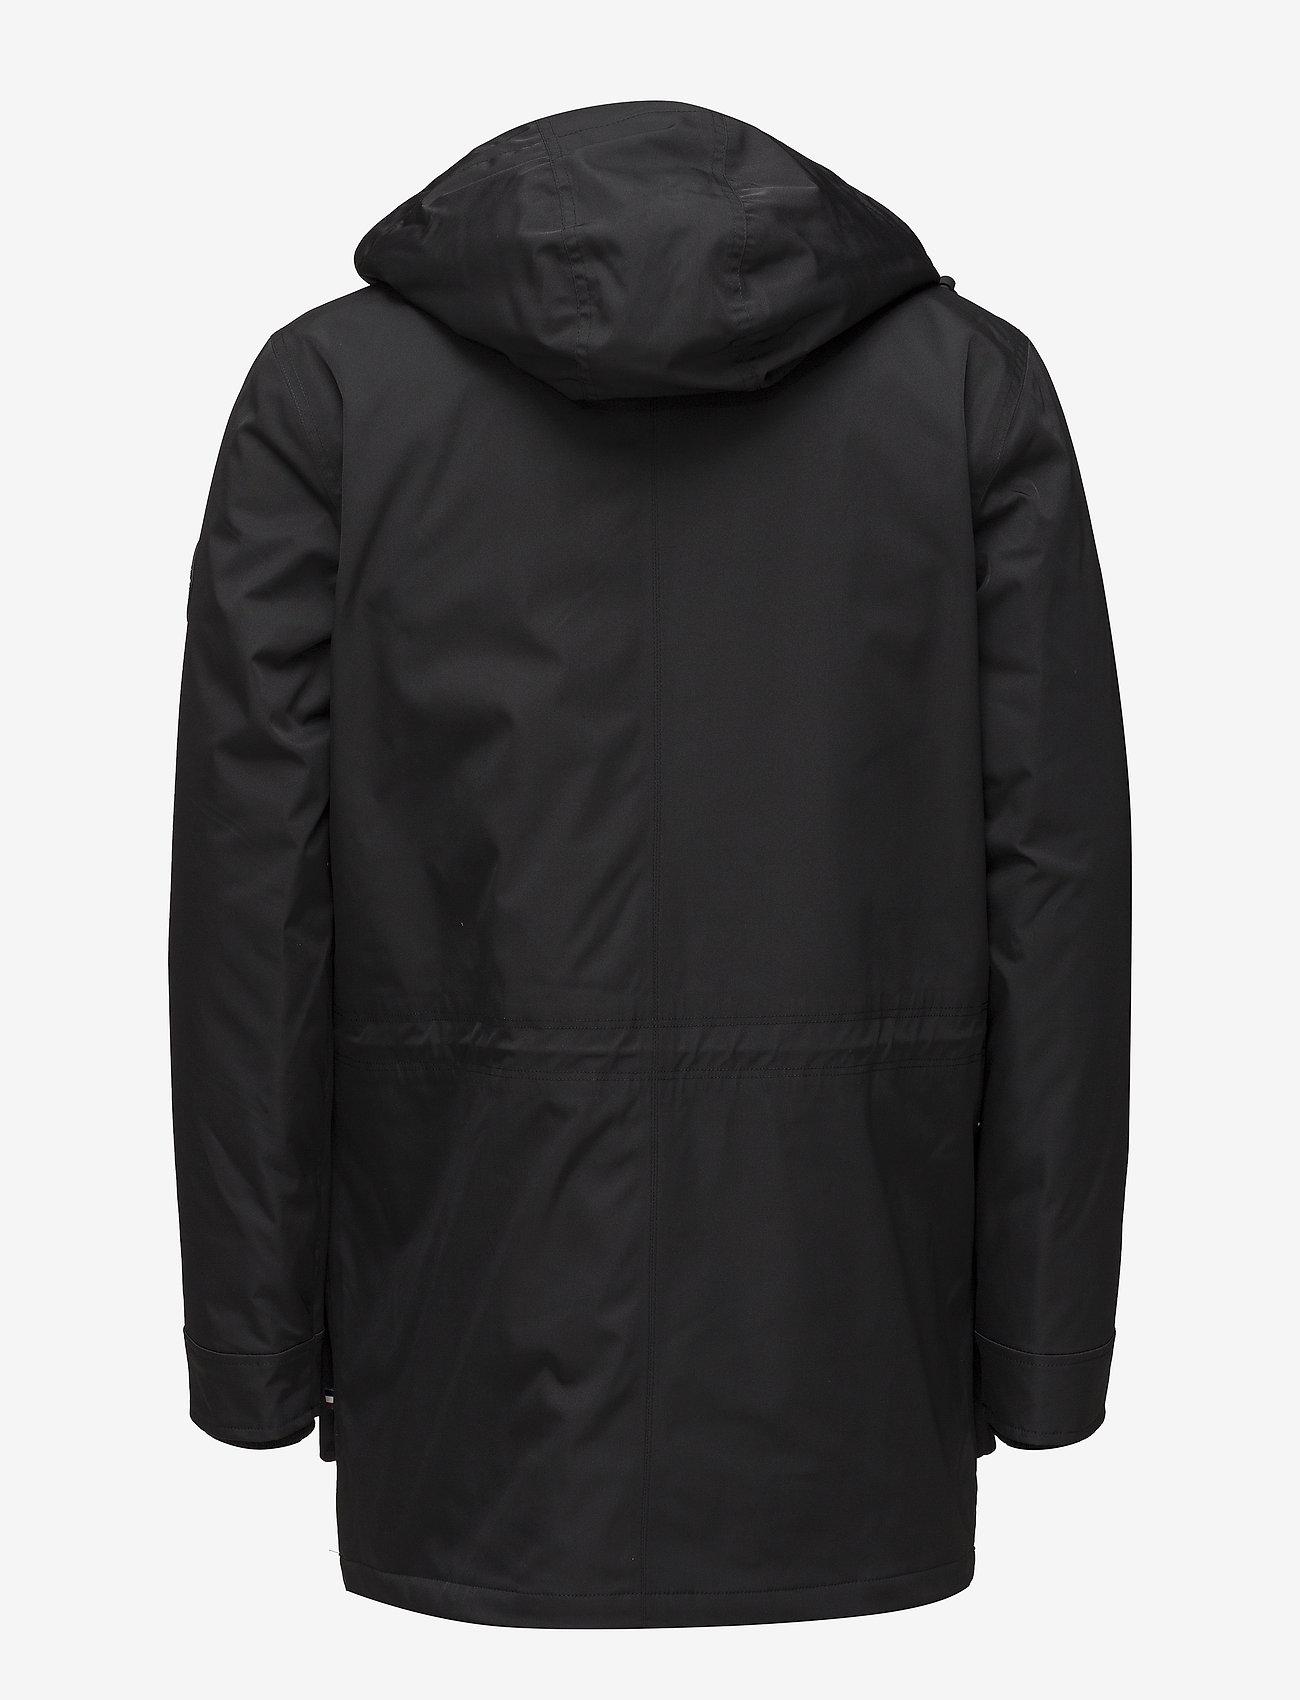 Lindbergh - Cargo jacket - doudounes - black